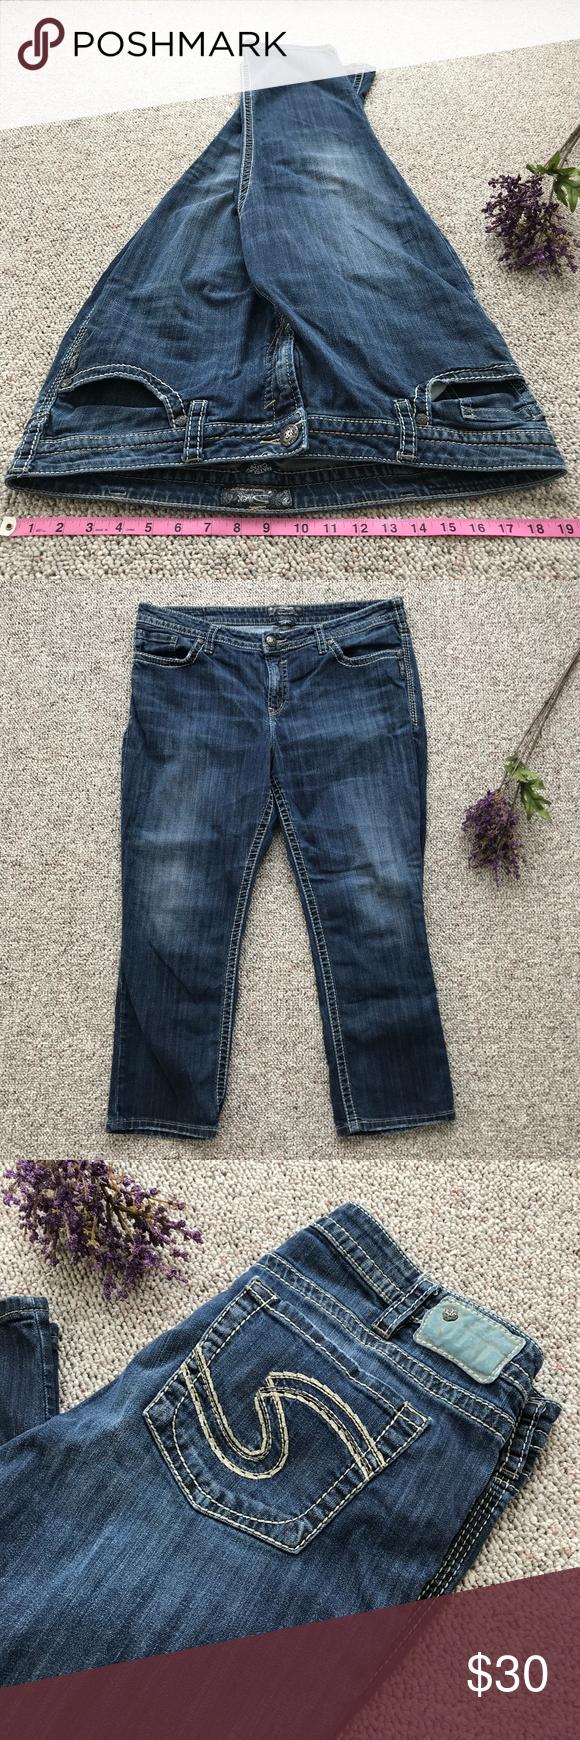 cecd6bde Silver Natsuki High Rise Jeans Size 20 Preowned, excellent condition Silver Natsuki  High Rise Capri